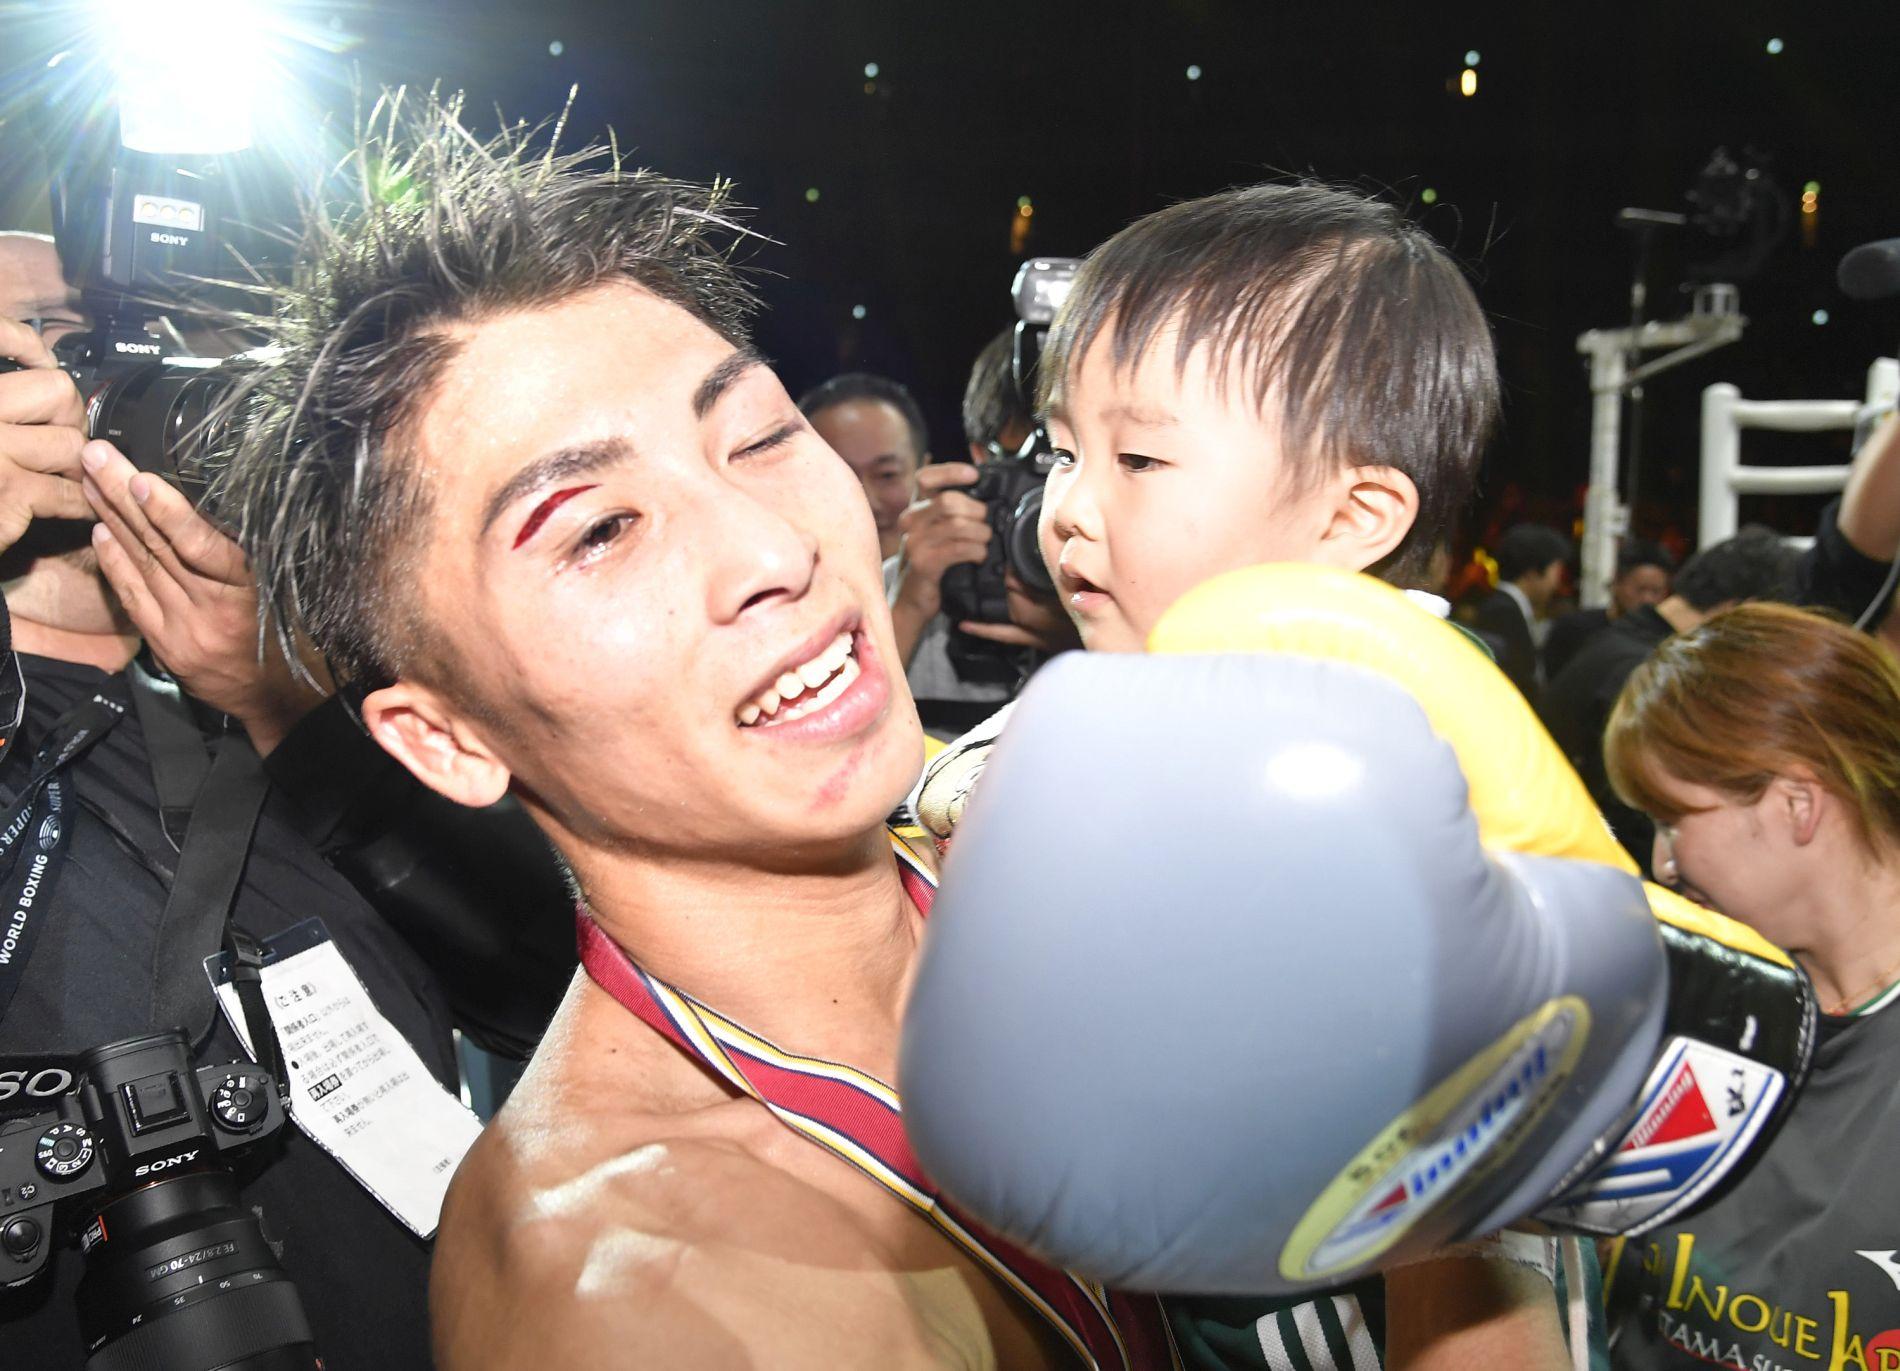 WBSS Match Naoya Inoue vs Nonito Donaire